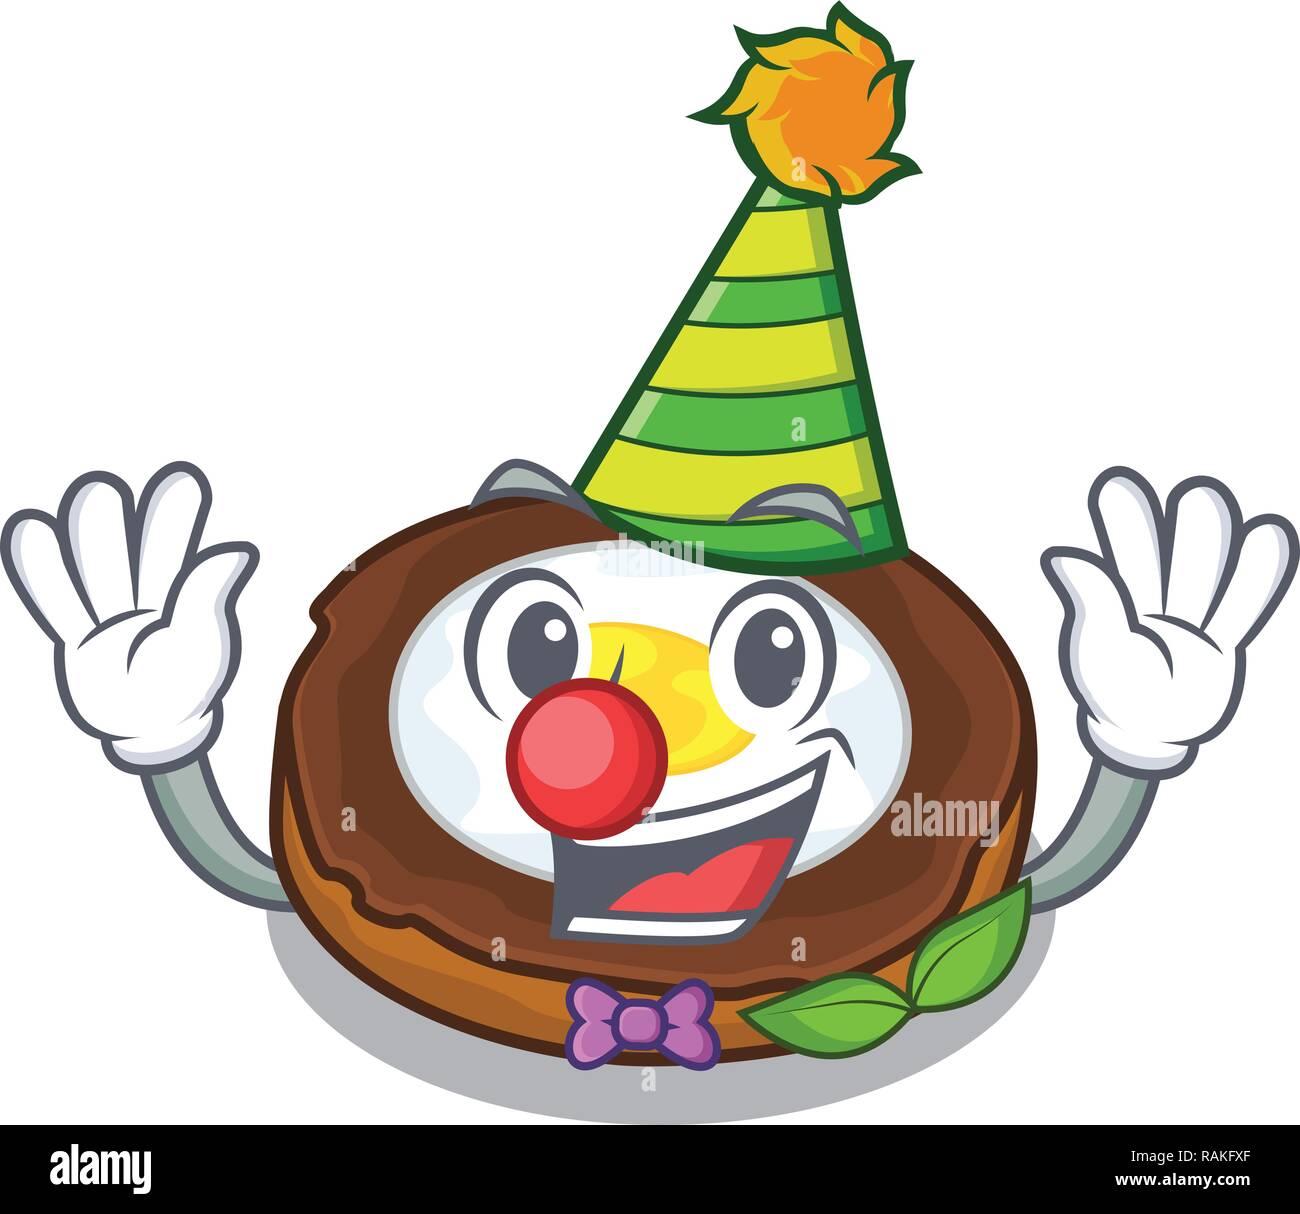 Clown scotch eggs at the mascot bowl - Stock Vector